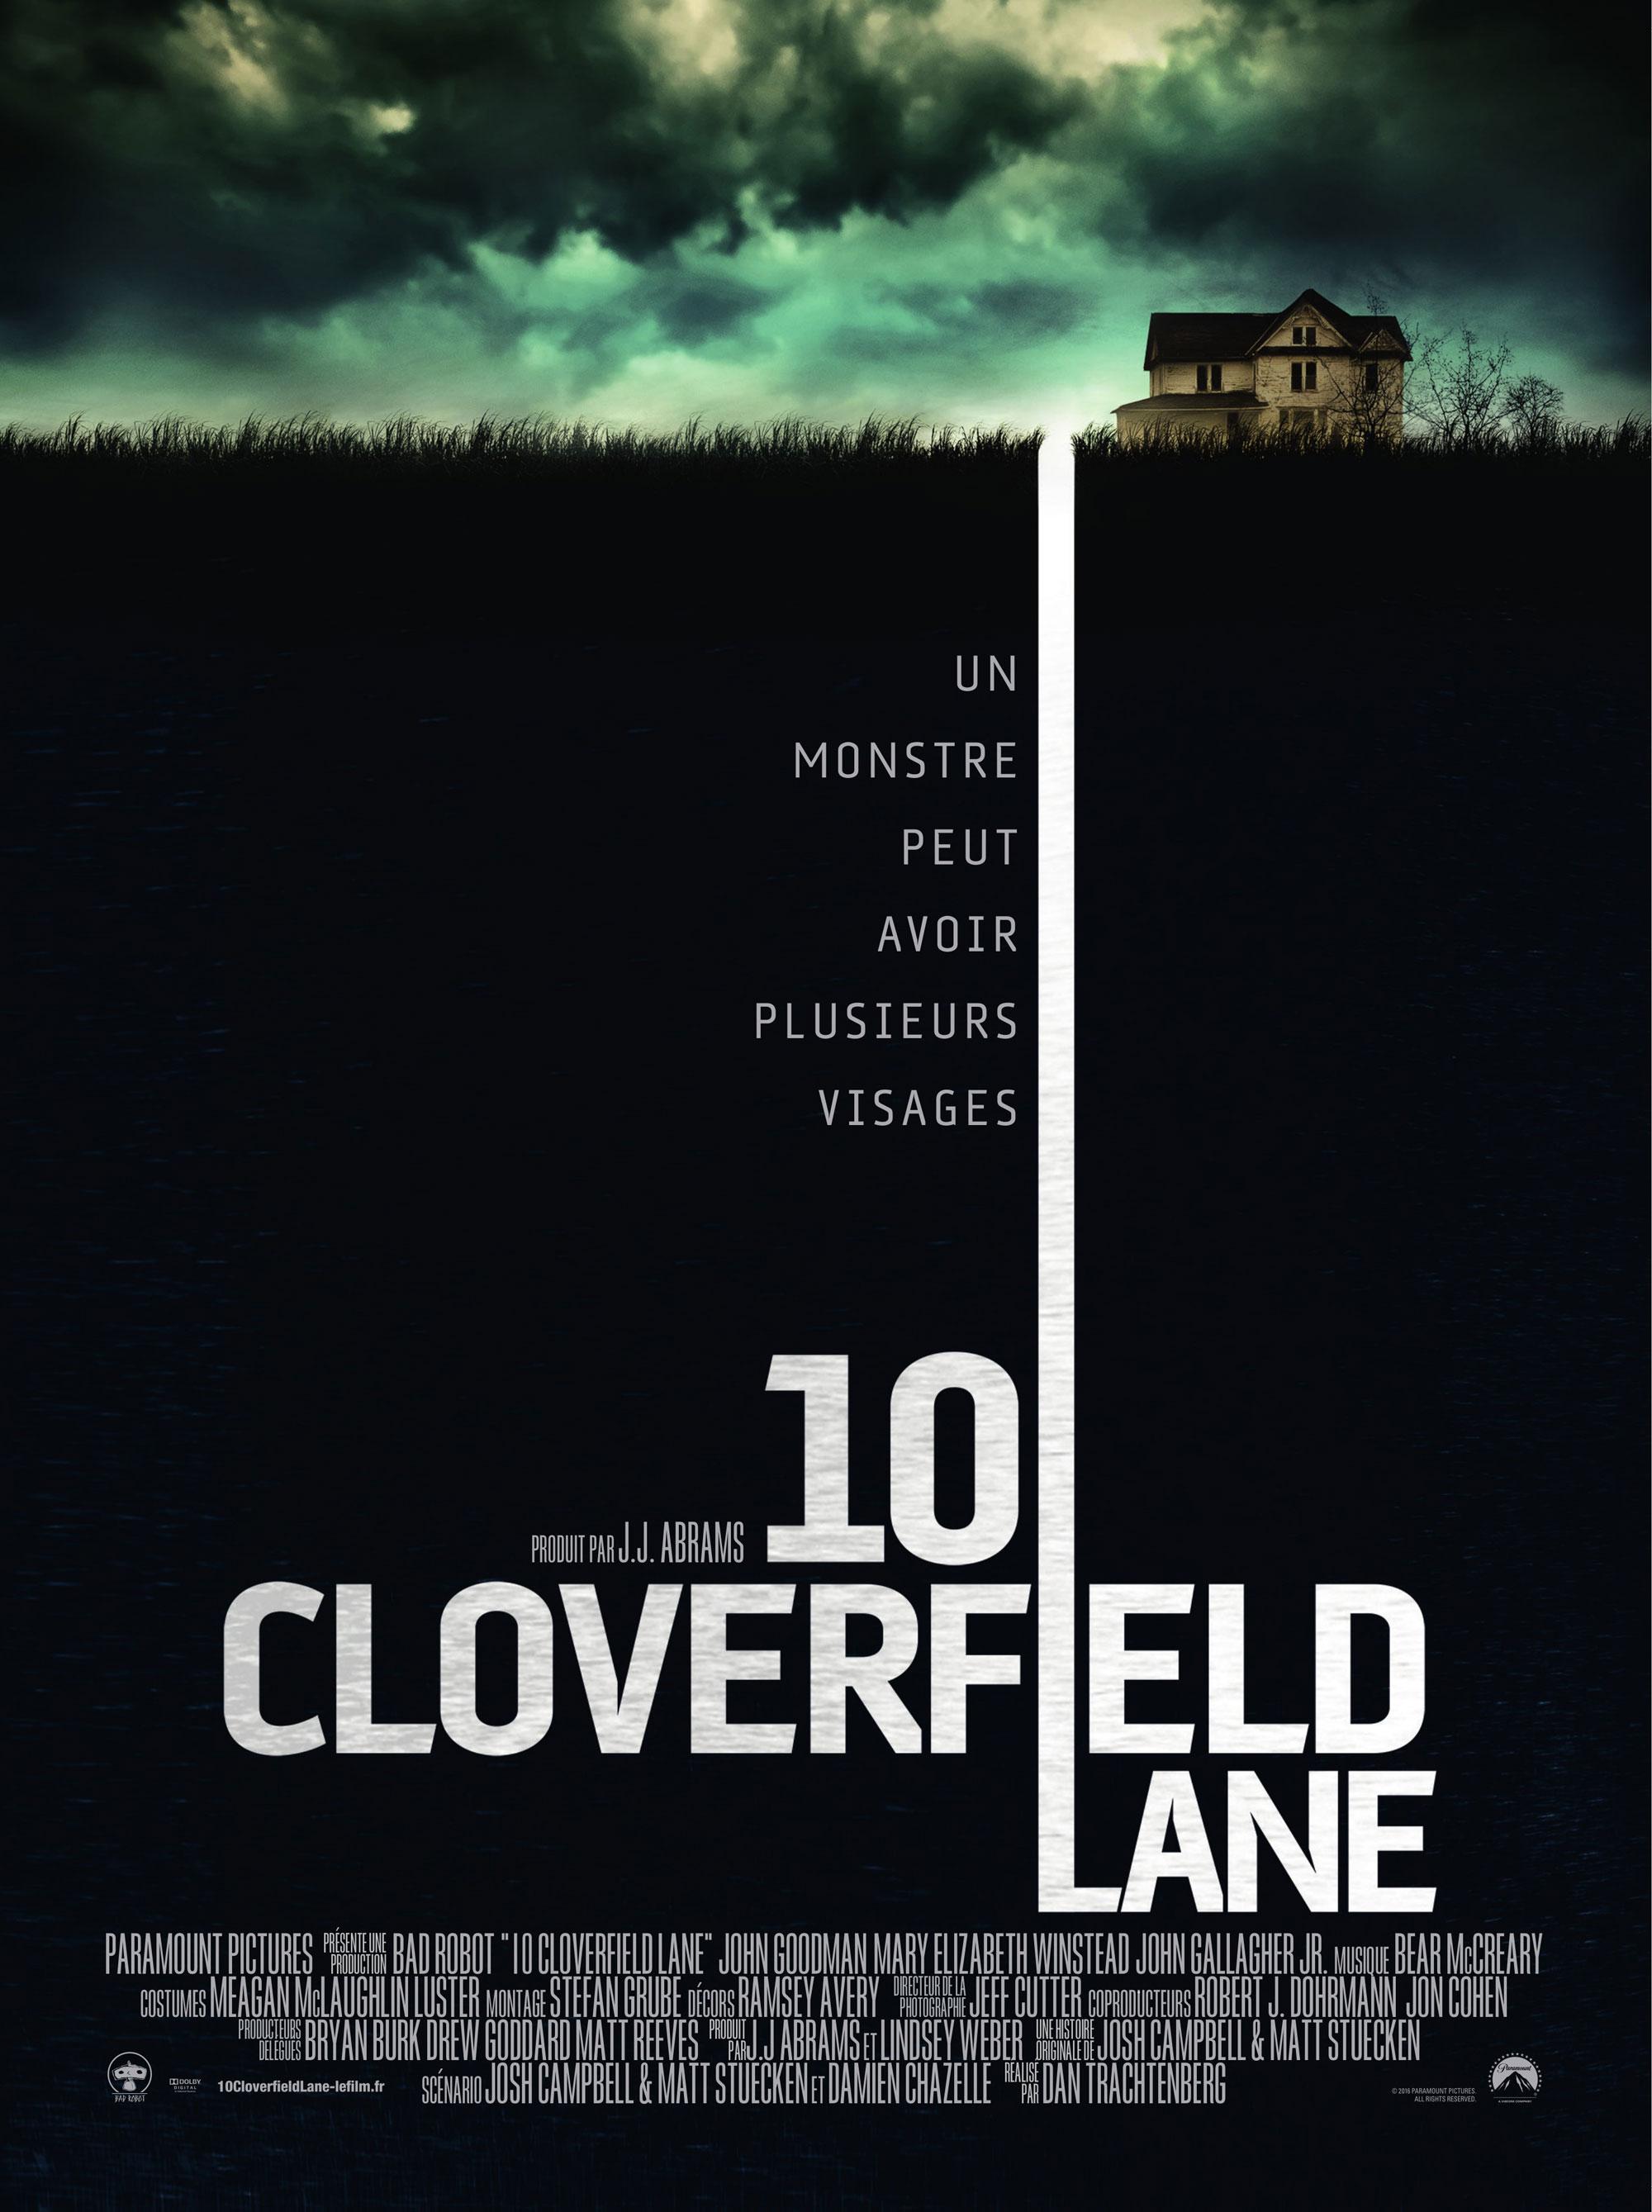 10 Cloverfield Lane - Affiche FR